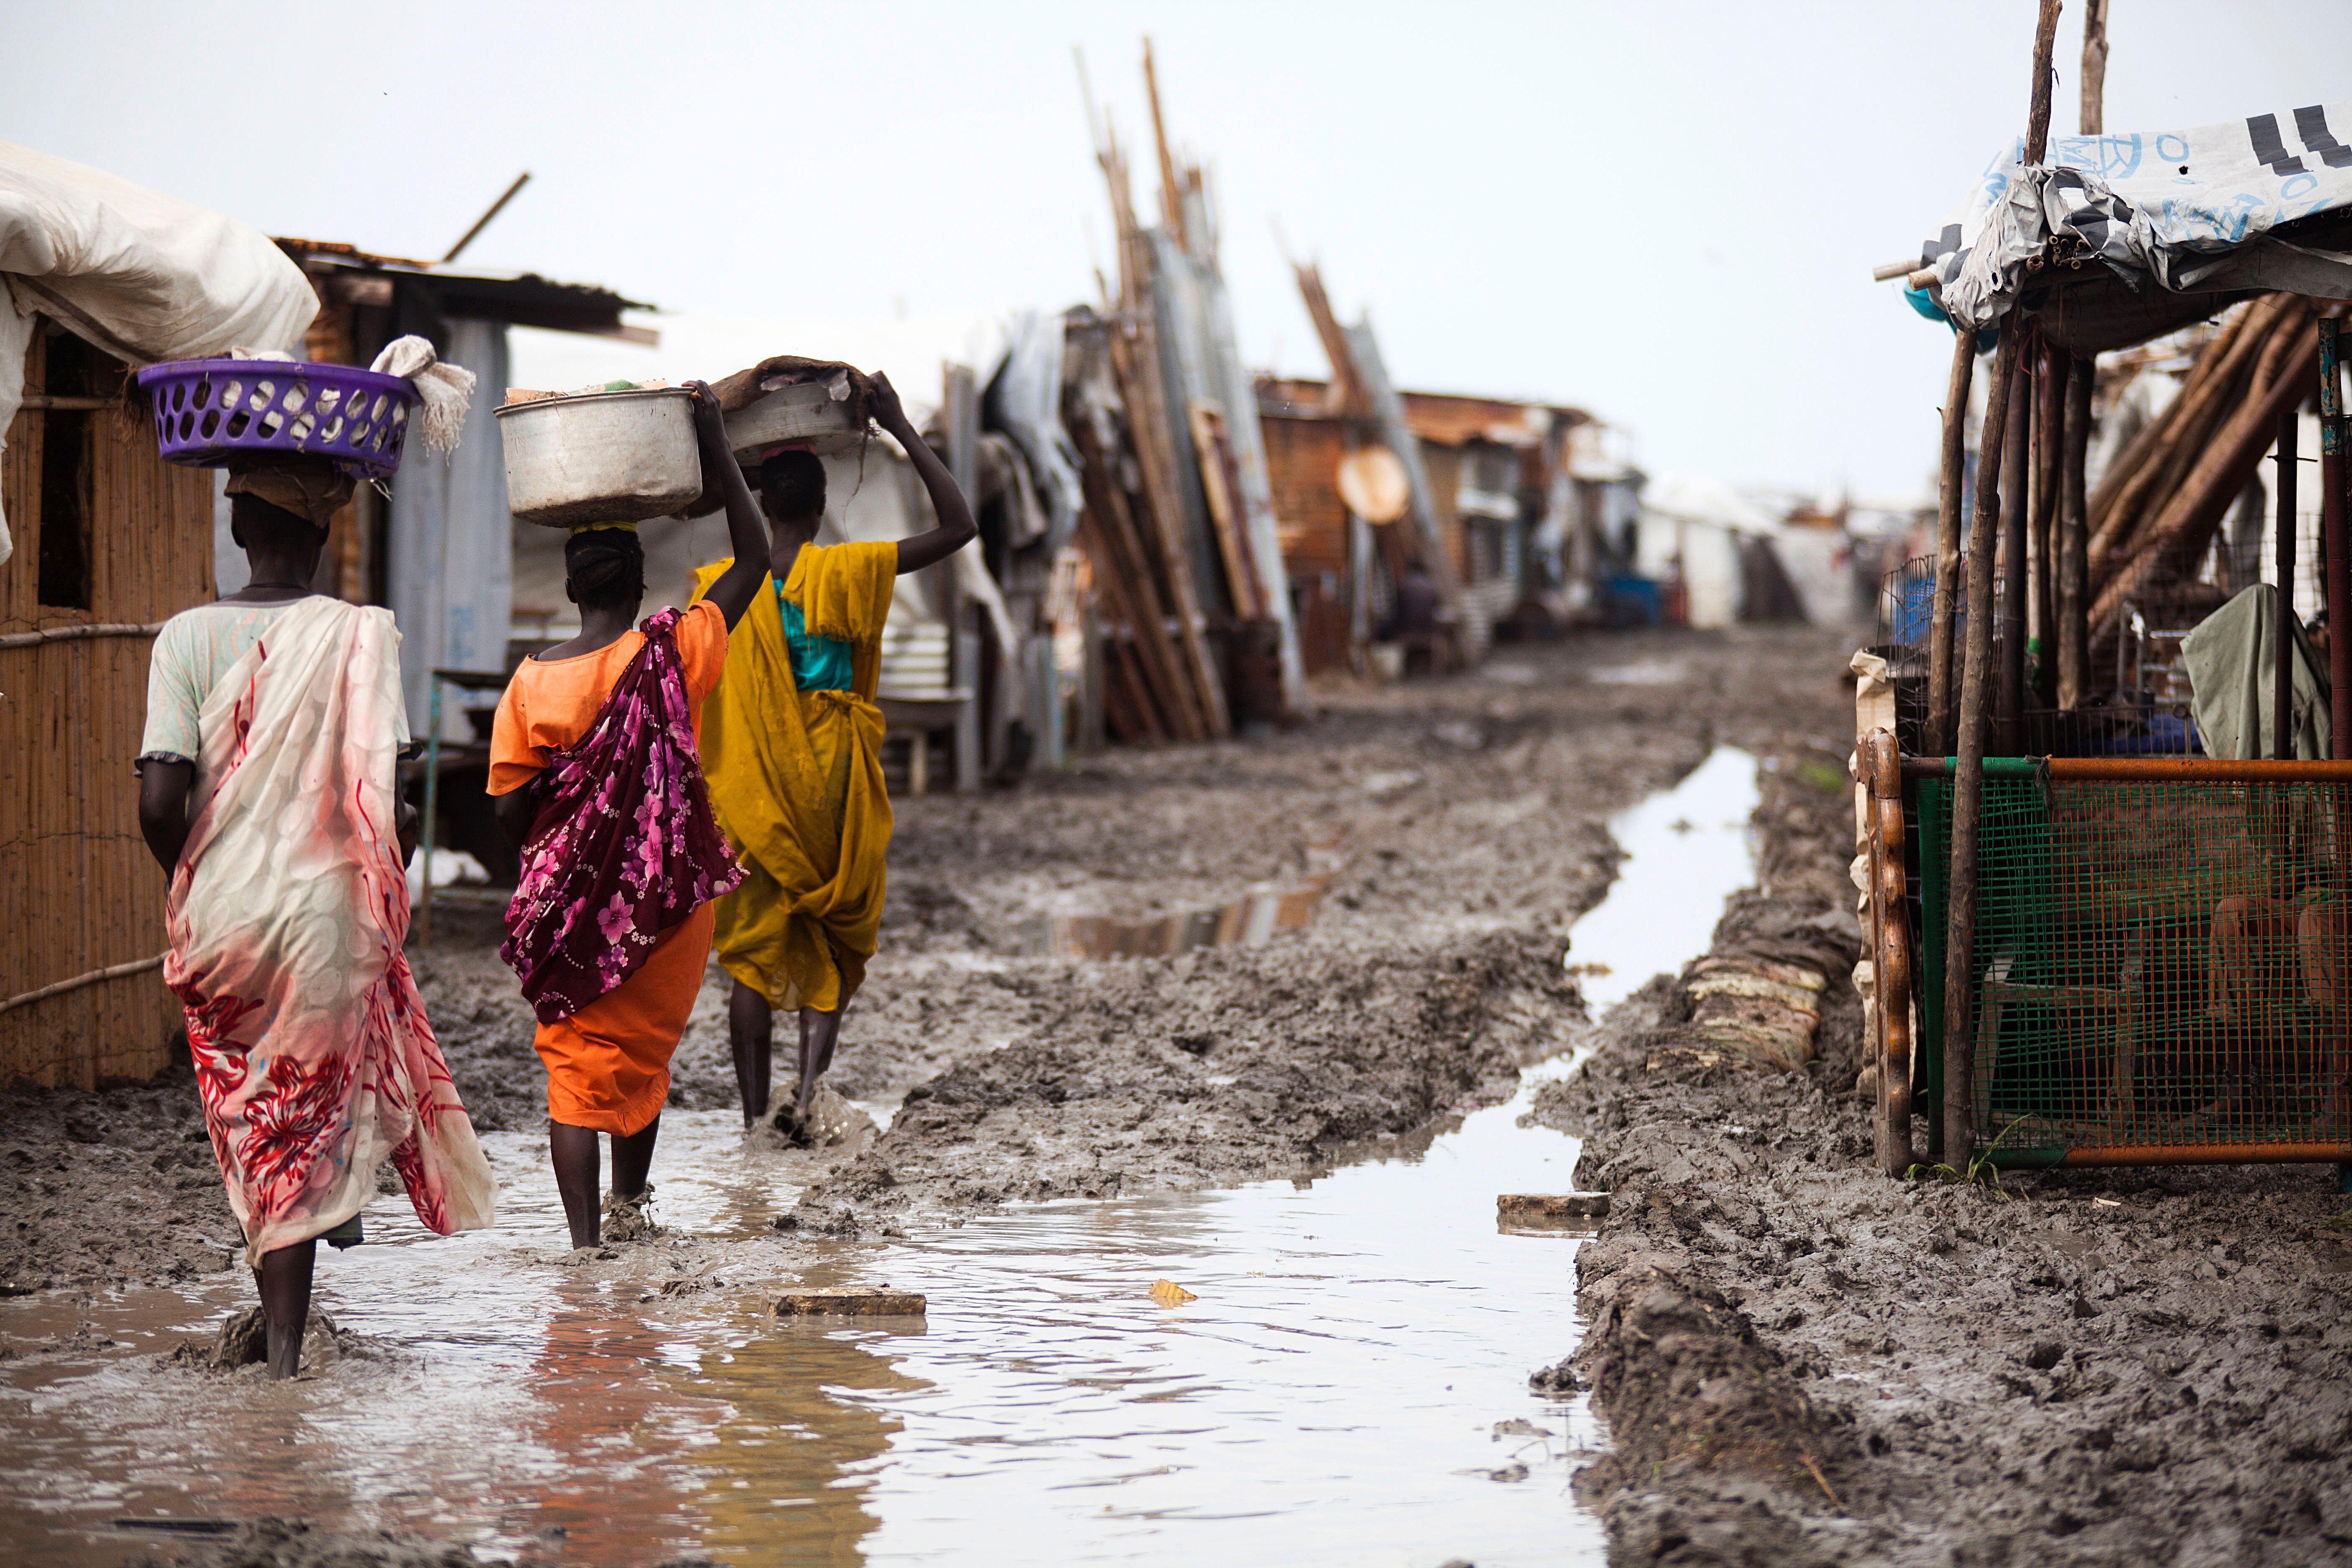 The Devastating Health Impact Of >> South Sudan Devastating Impact Of War On Mental Health Must Be